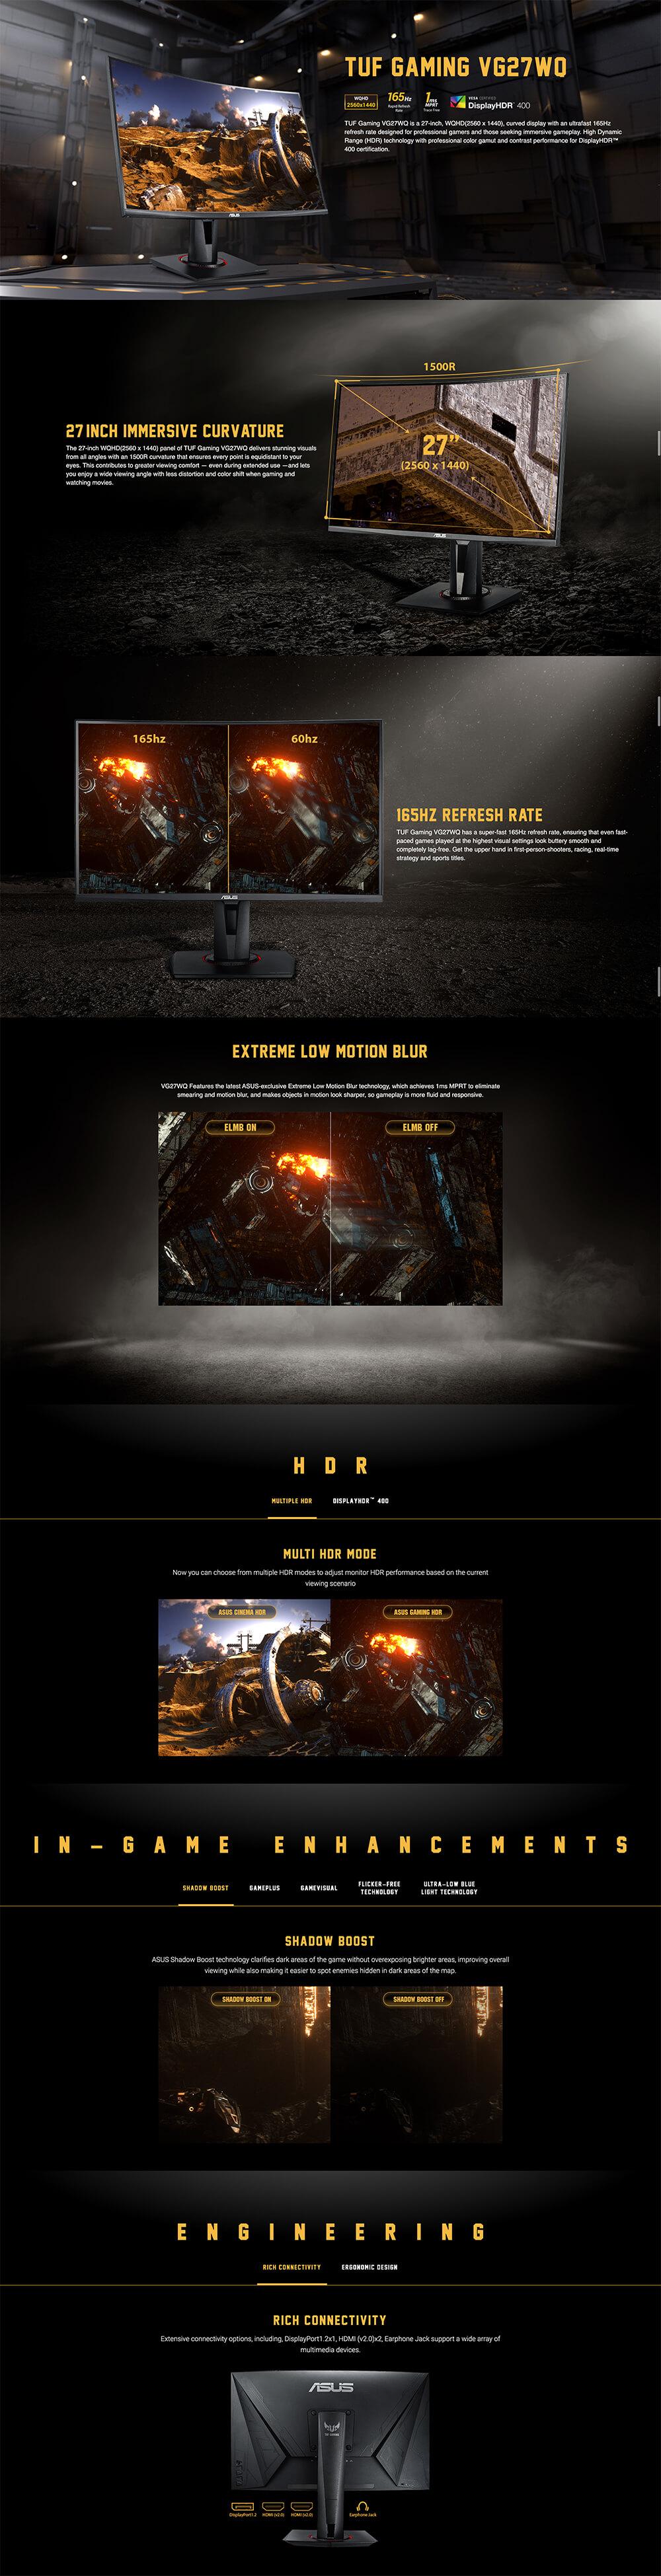 Asus TUF Gaming VG27WQ Curved Monitor – 27 inch - WQHD - 165Hz - 1ms MPRT - HDR 400